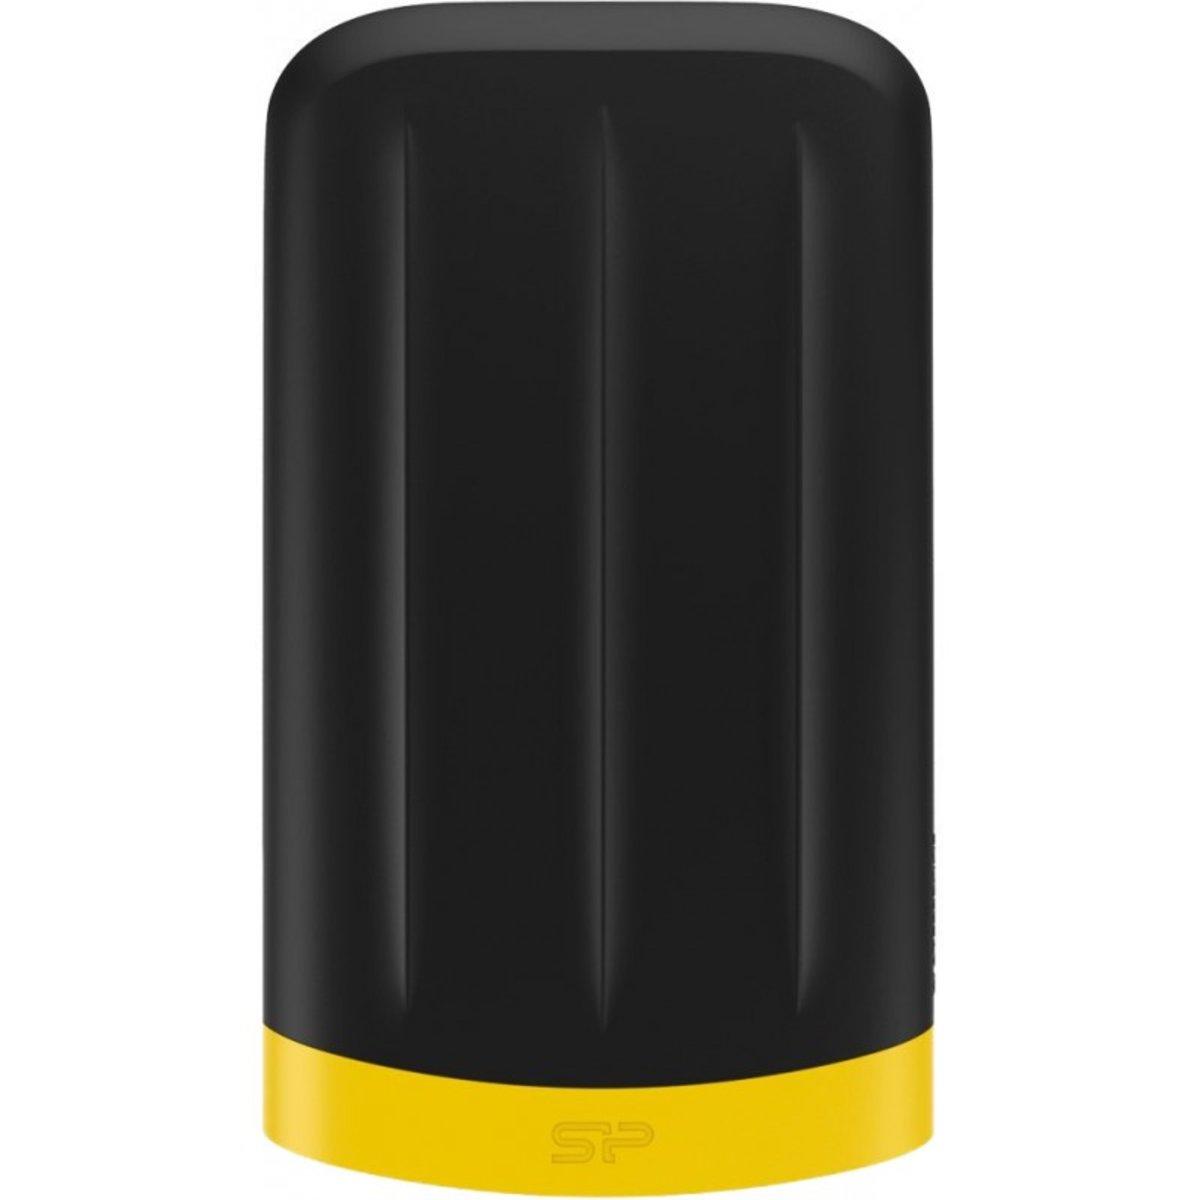 Armor A65 2.5吋 USB 3.0 A65 移動硬碟 黑色 1TB